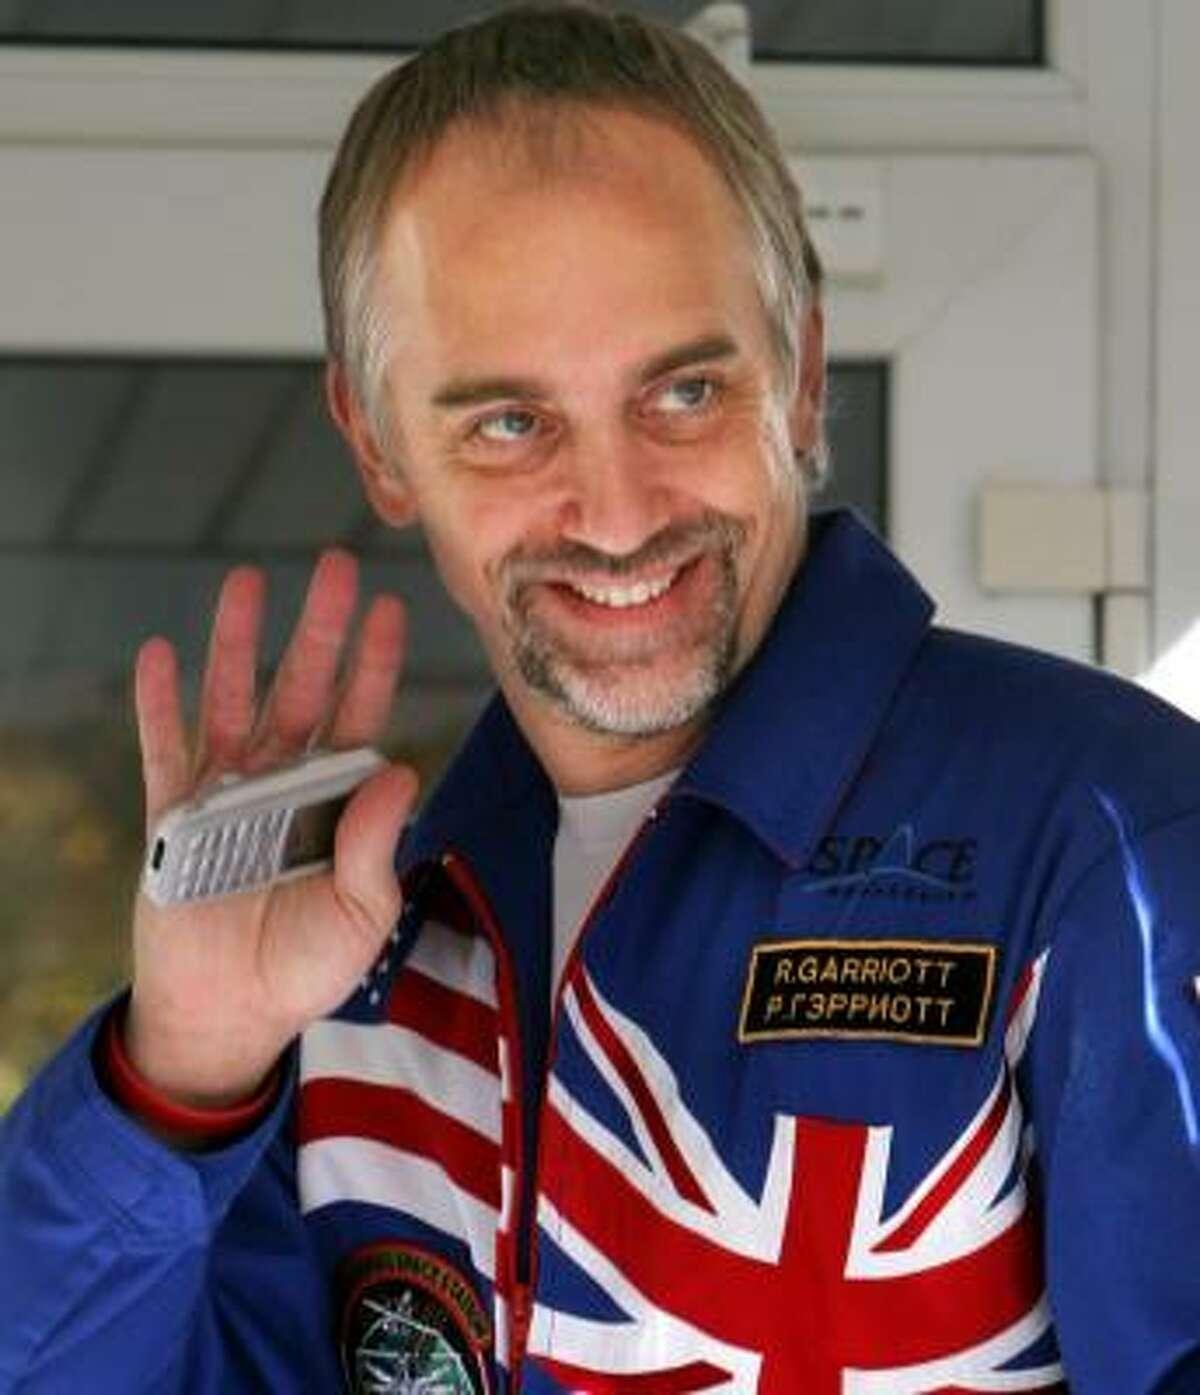 Richard Garriott will depart on the Soyuz Sunday.